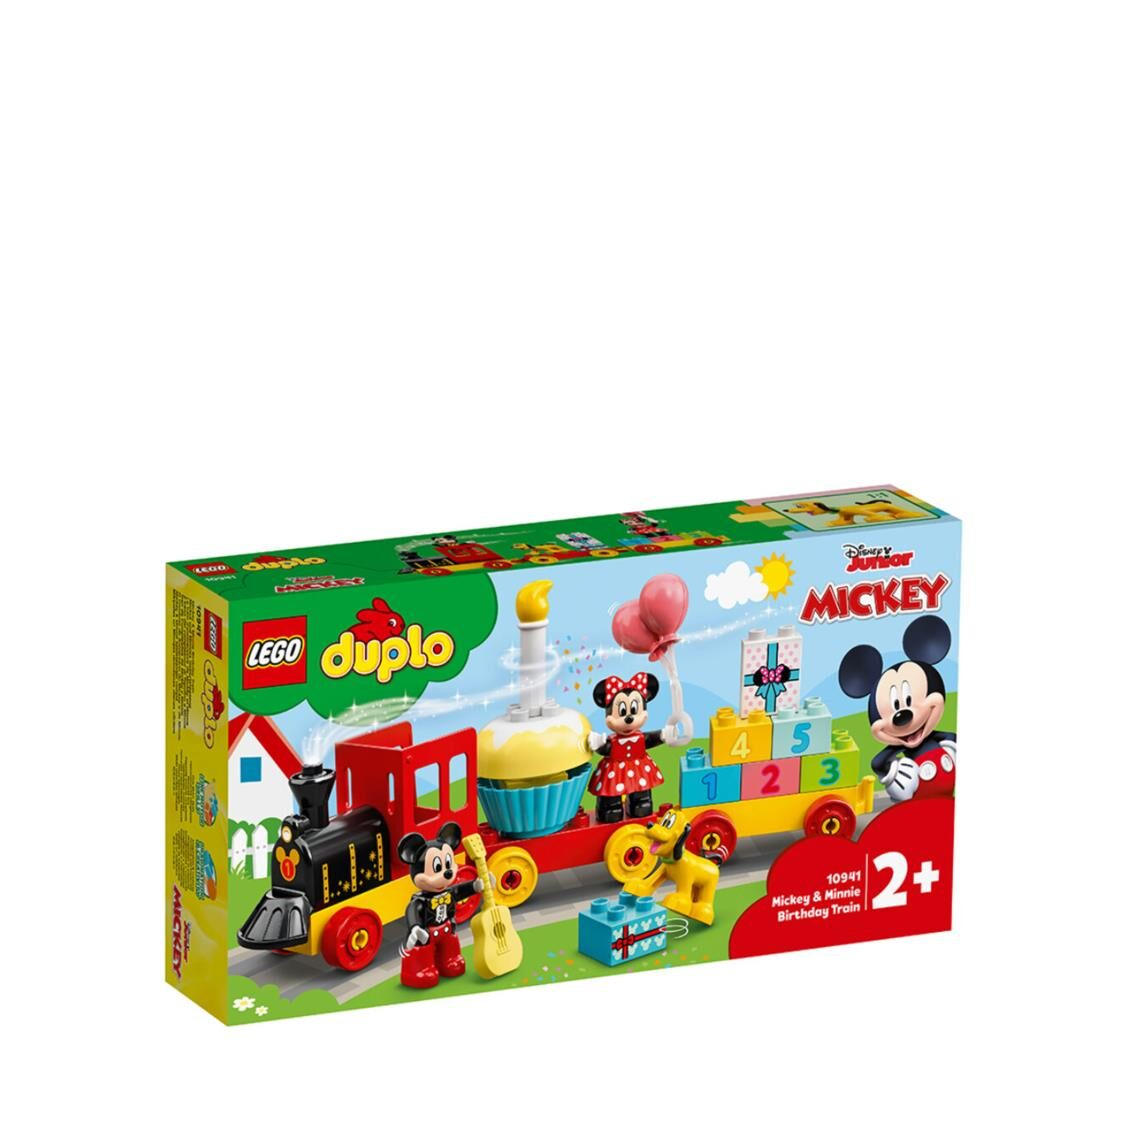 LEGO DUPLO Disney - Mickey  Minnie Birthday Train 10941